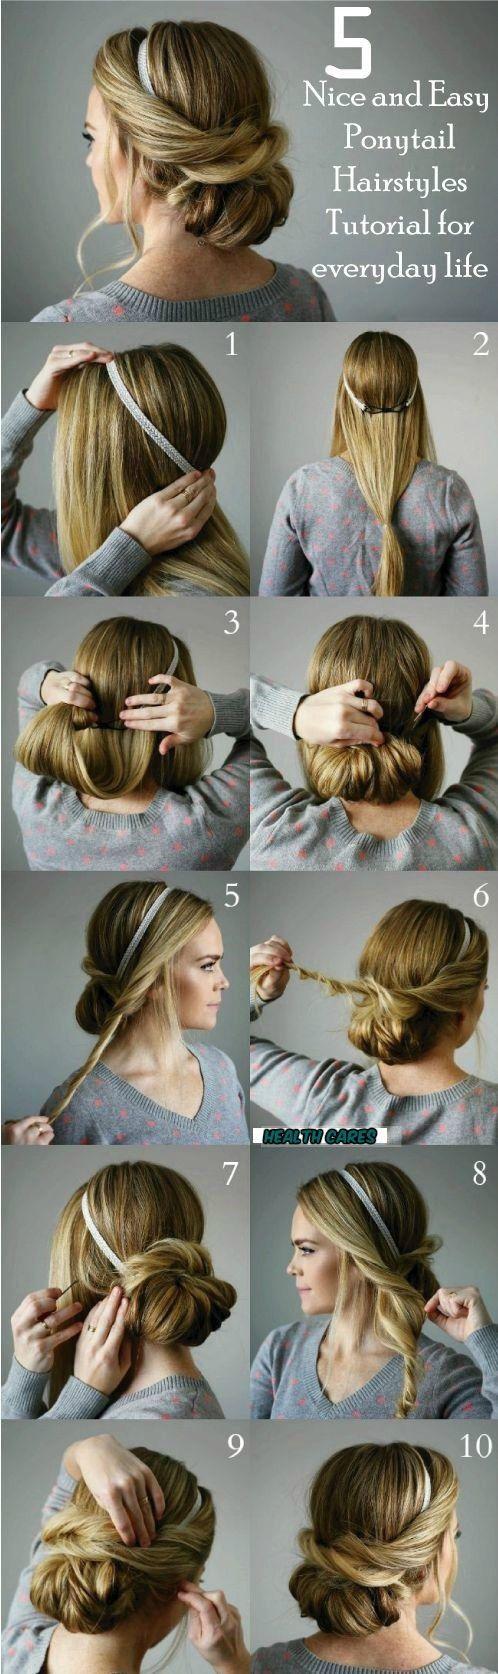 easy ponytail hairstyles quick u easy girls hairstyles hair